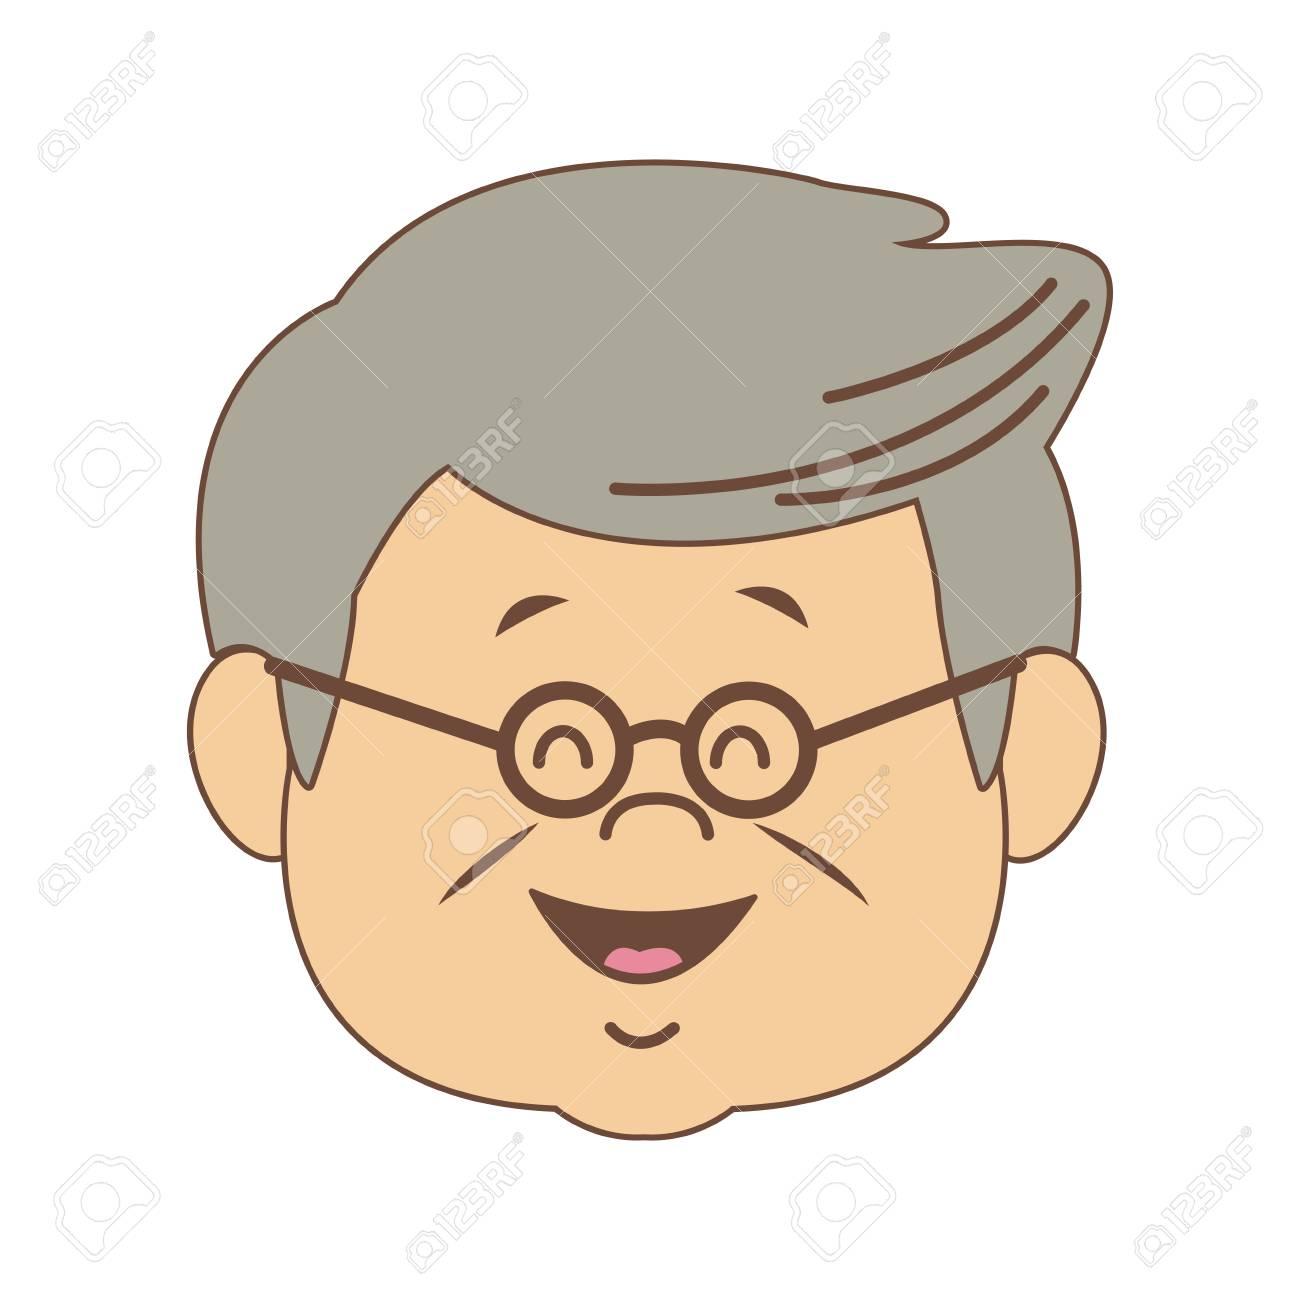 Cute grandfather face cartoon vector illustration graphic design.